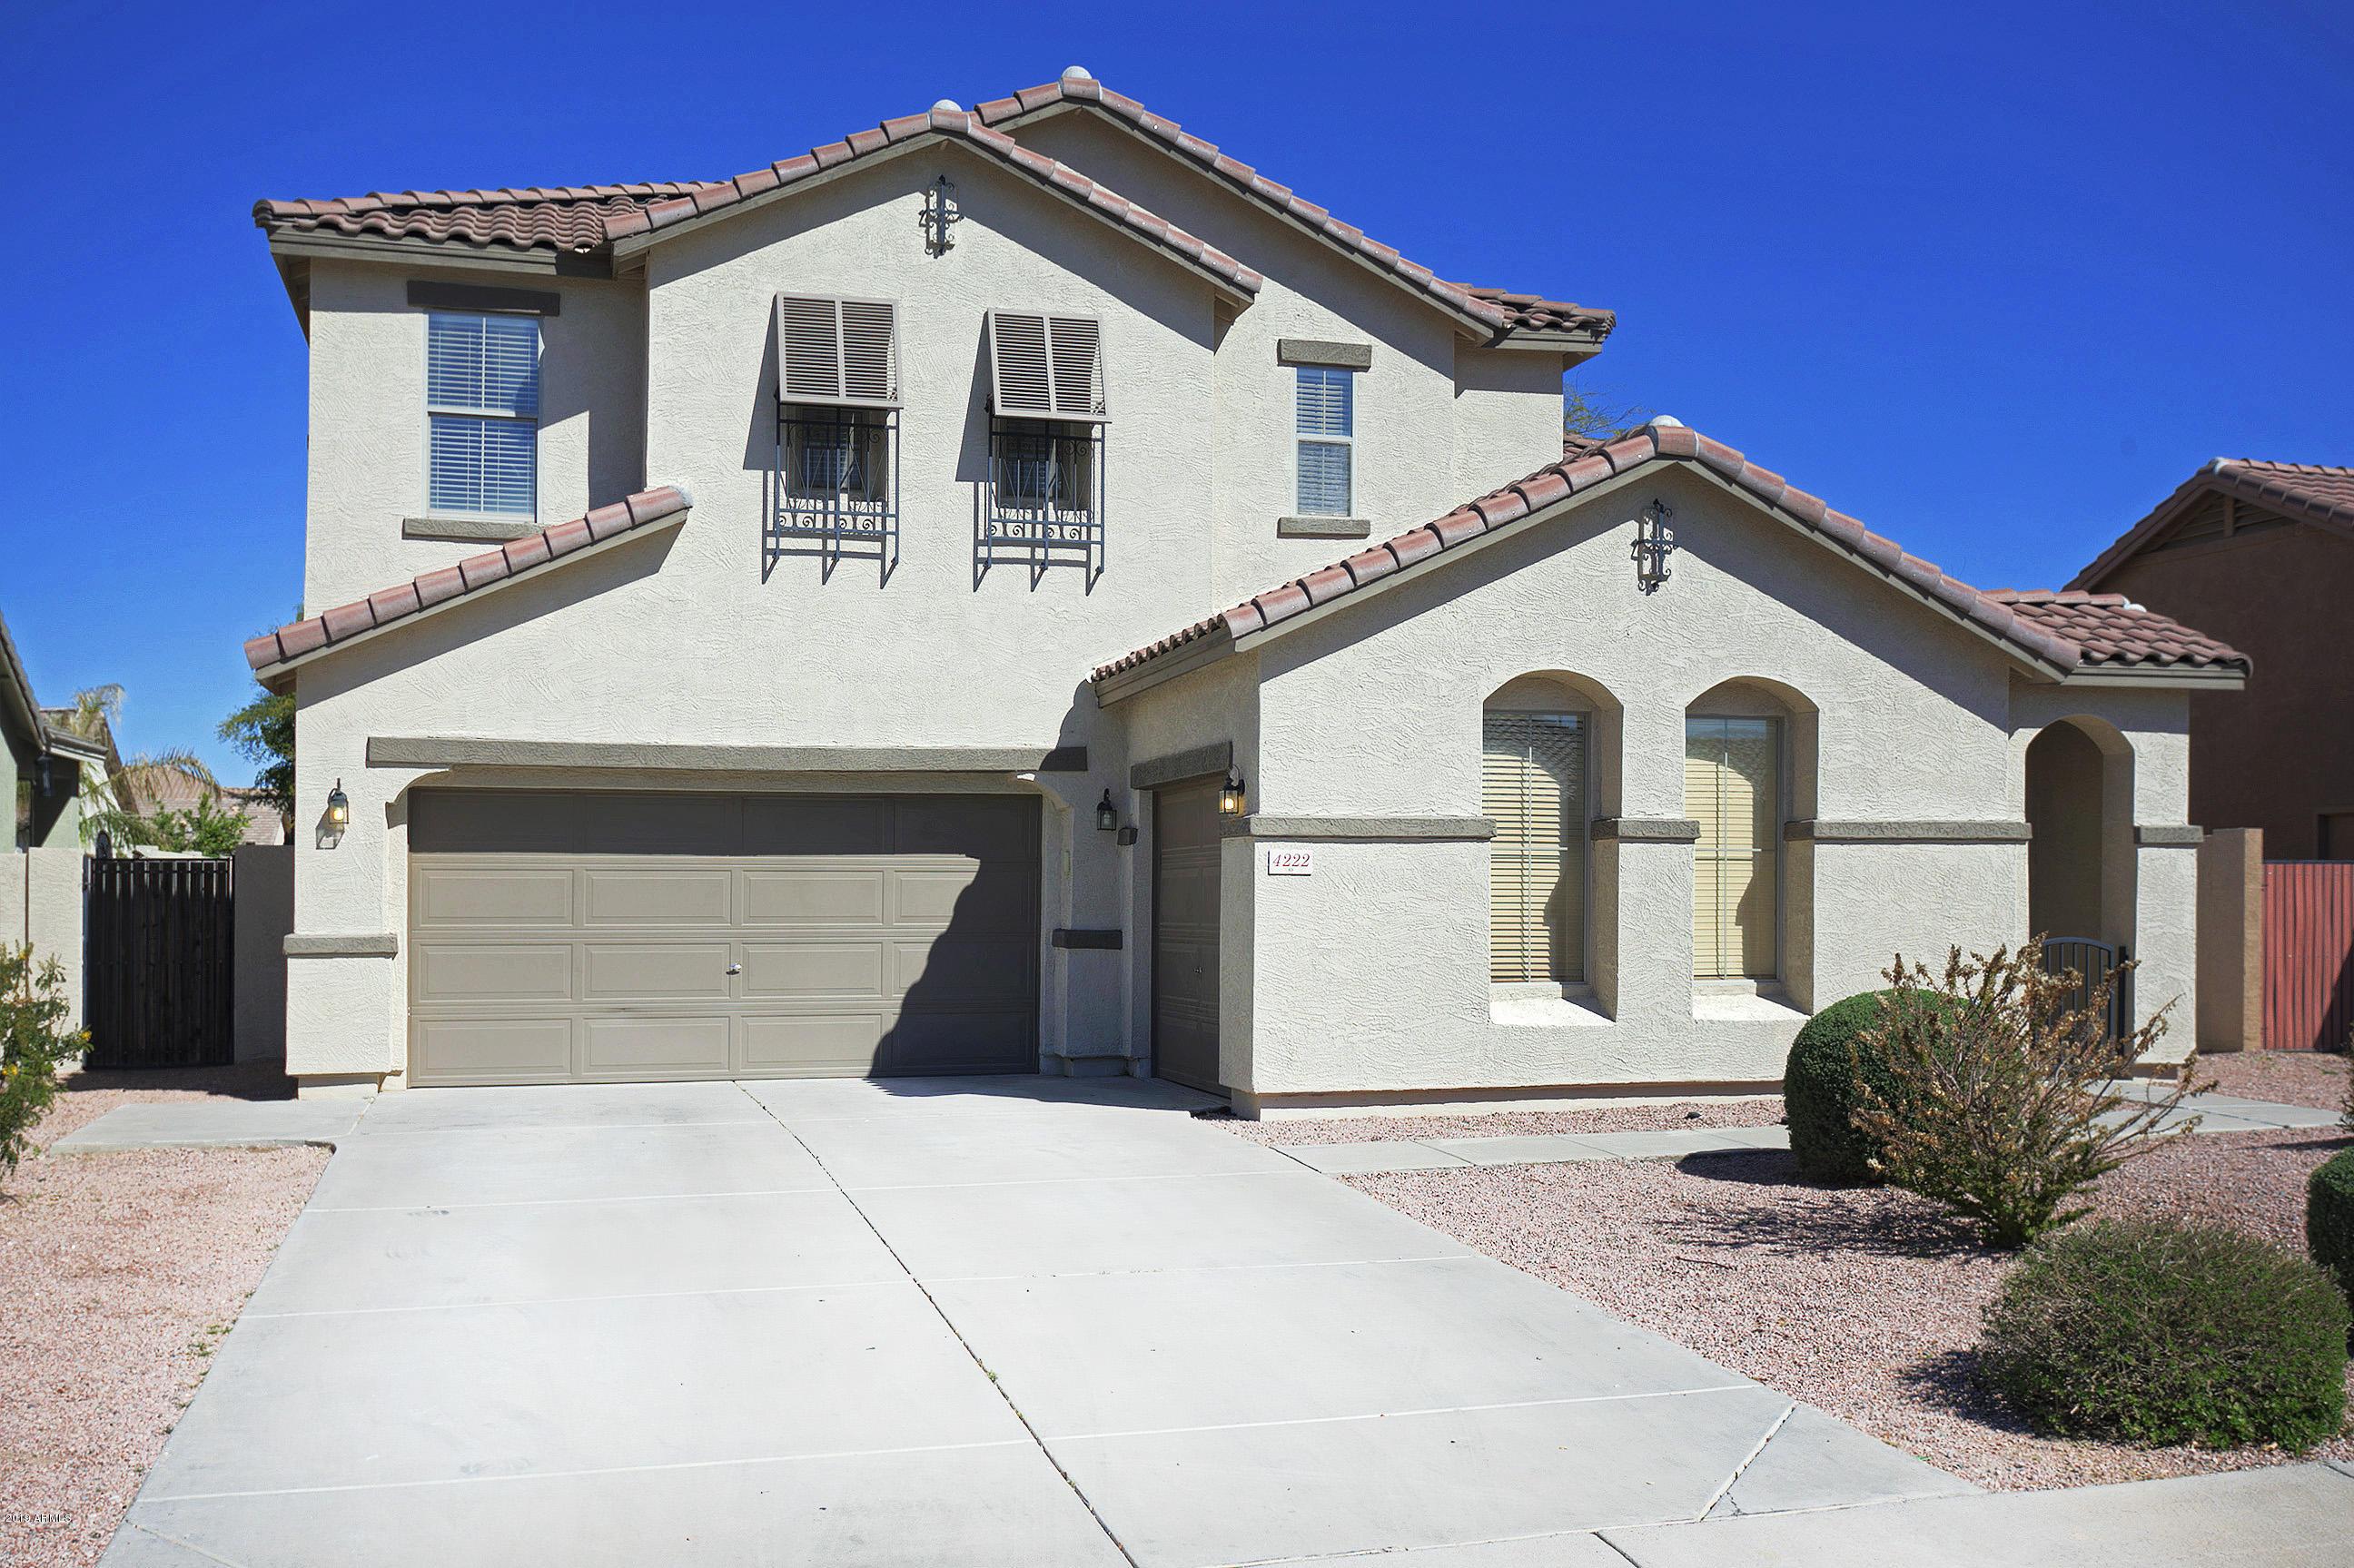 Photo of 4222 E Palm Beach Drive, Chandler, AZ 85249